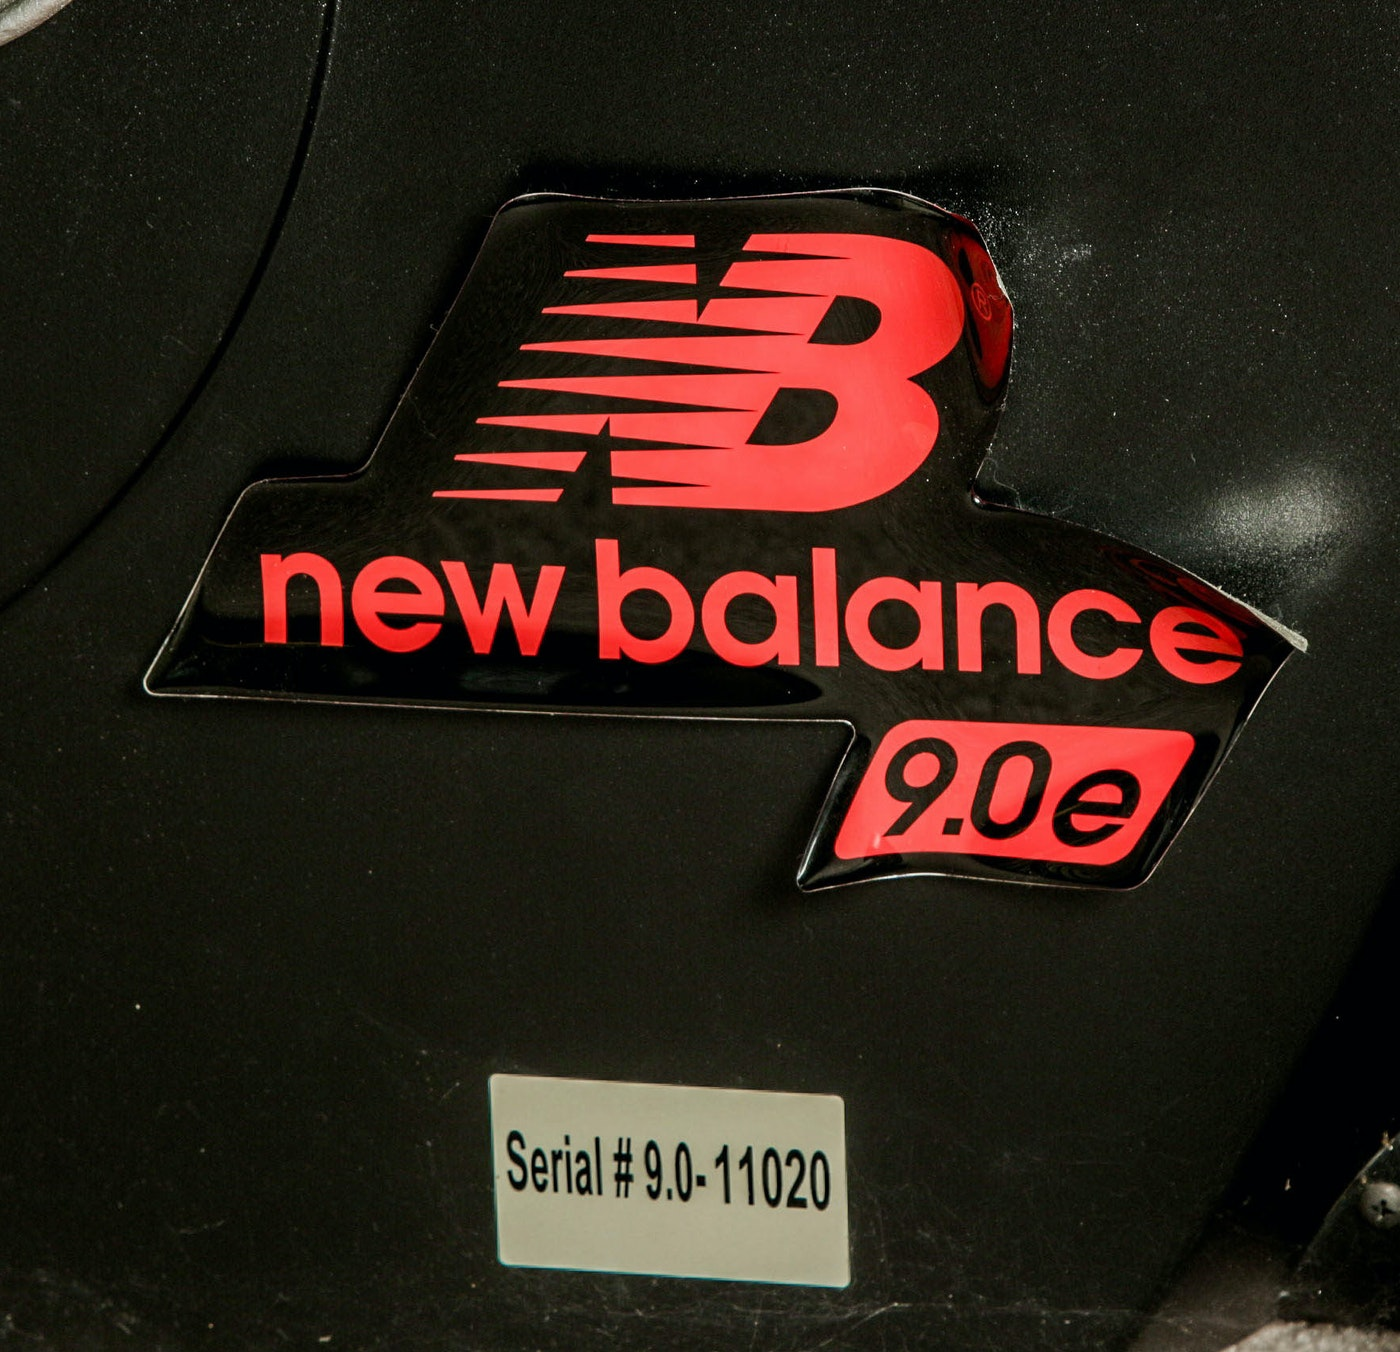 New Balance 9.0e Elliptical Machine